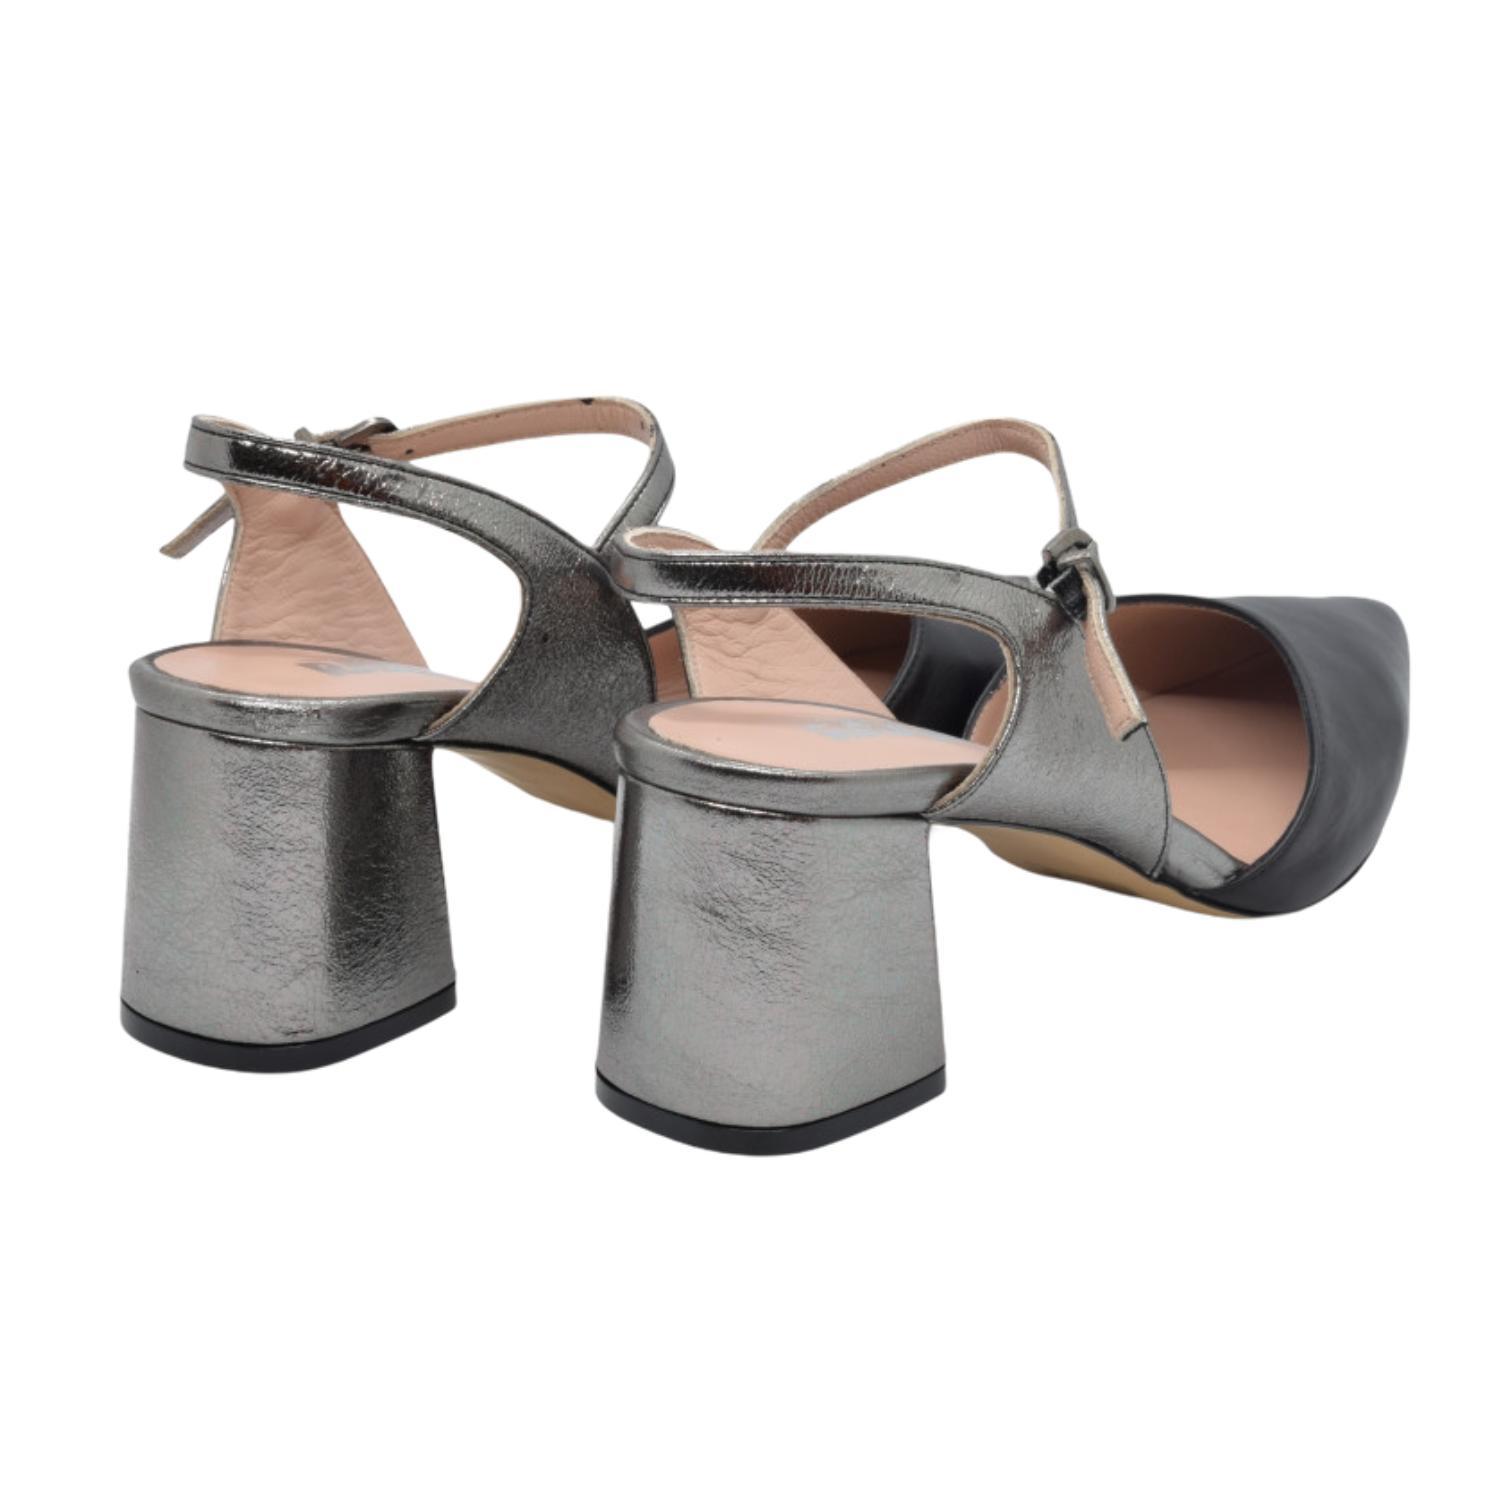 Pantofi decupati negri cu barete argintii